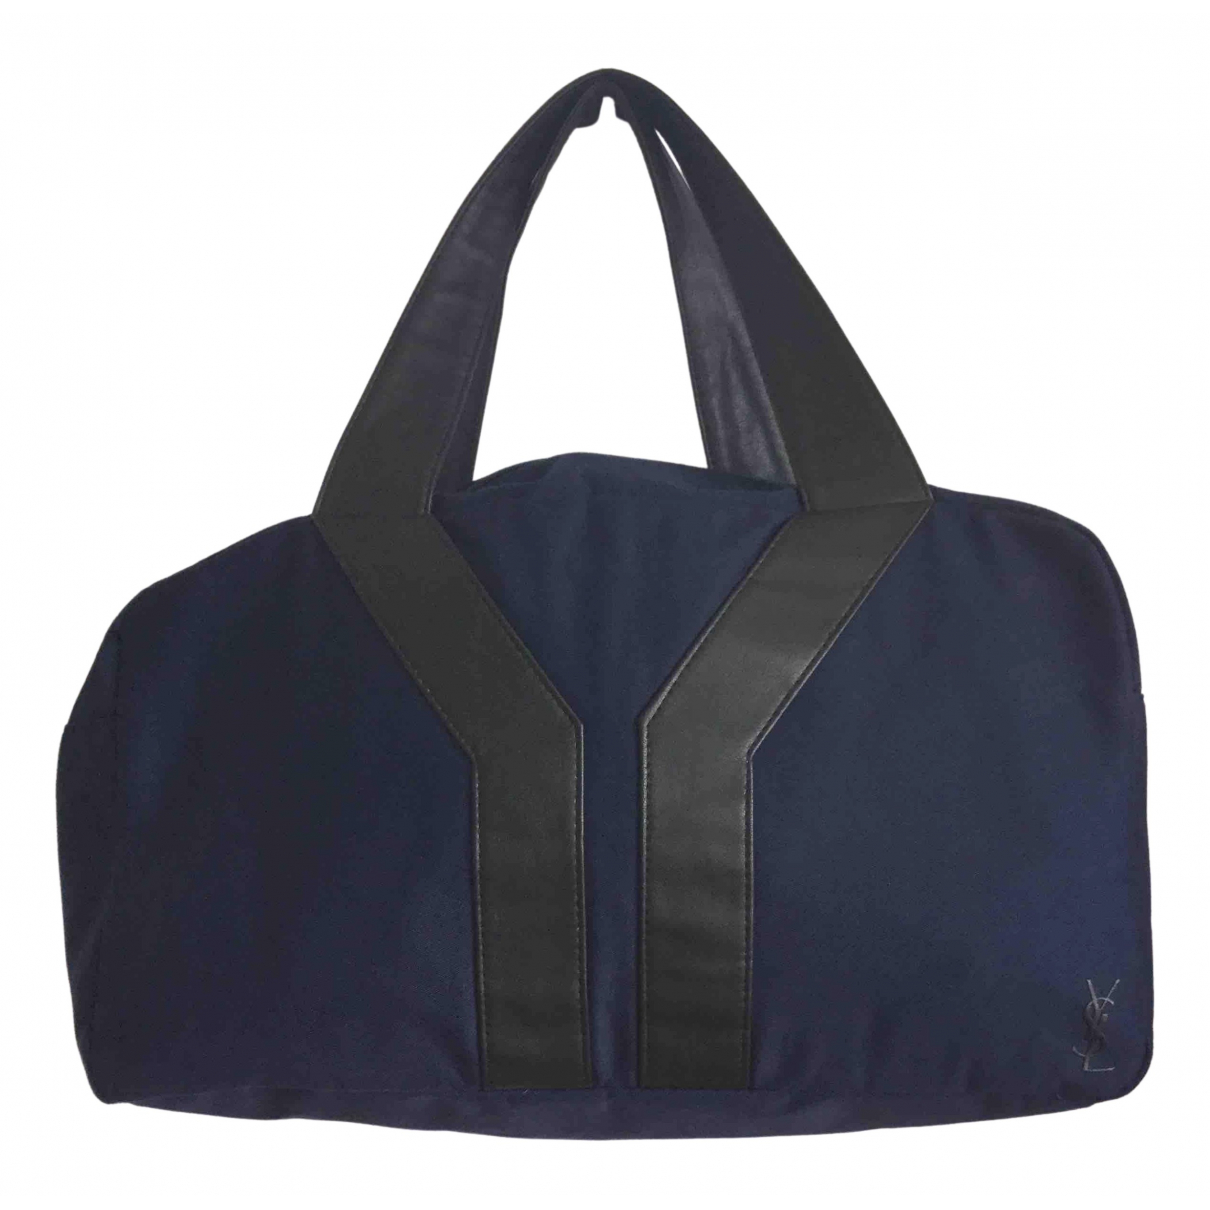 Yves Saint Laurent \N Blue Cloth handbag for Women \N